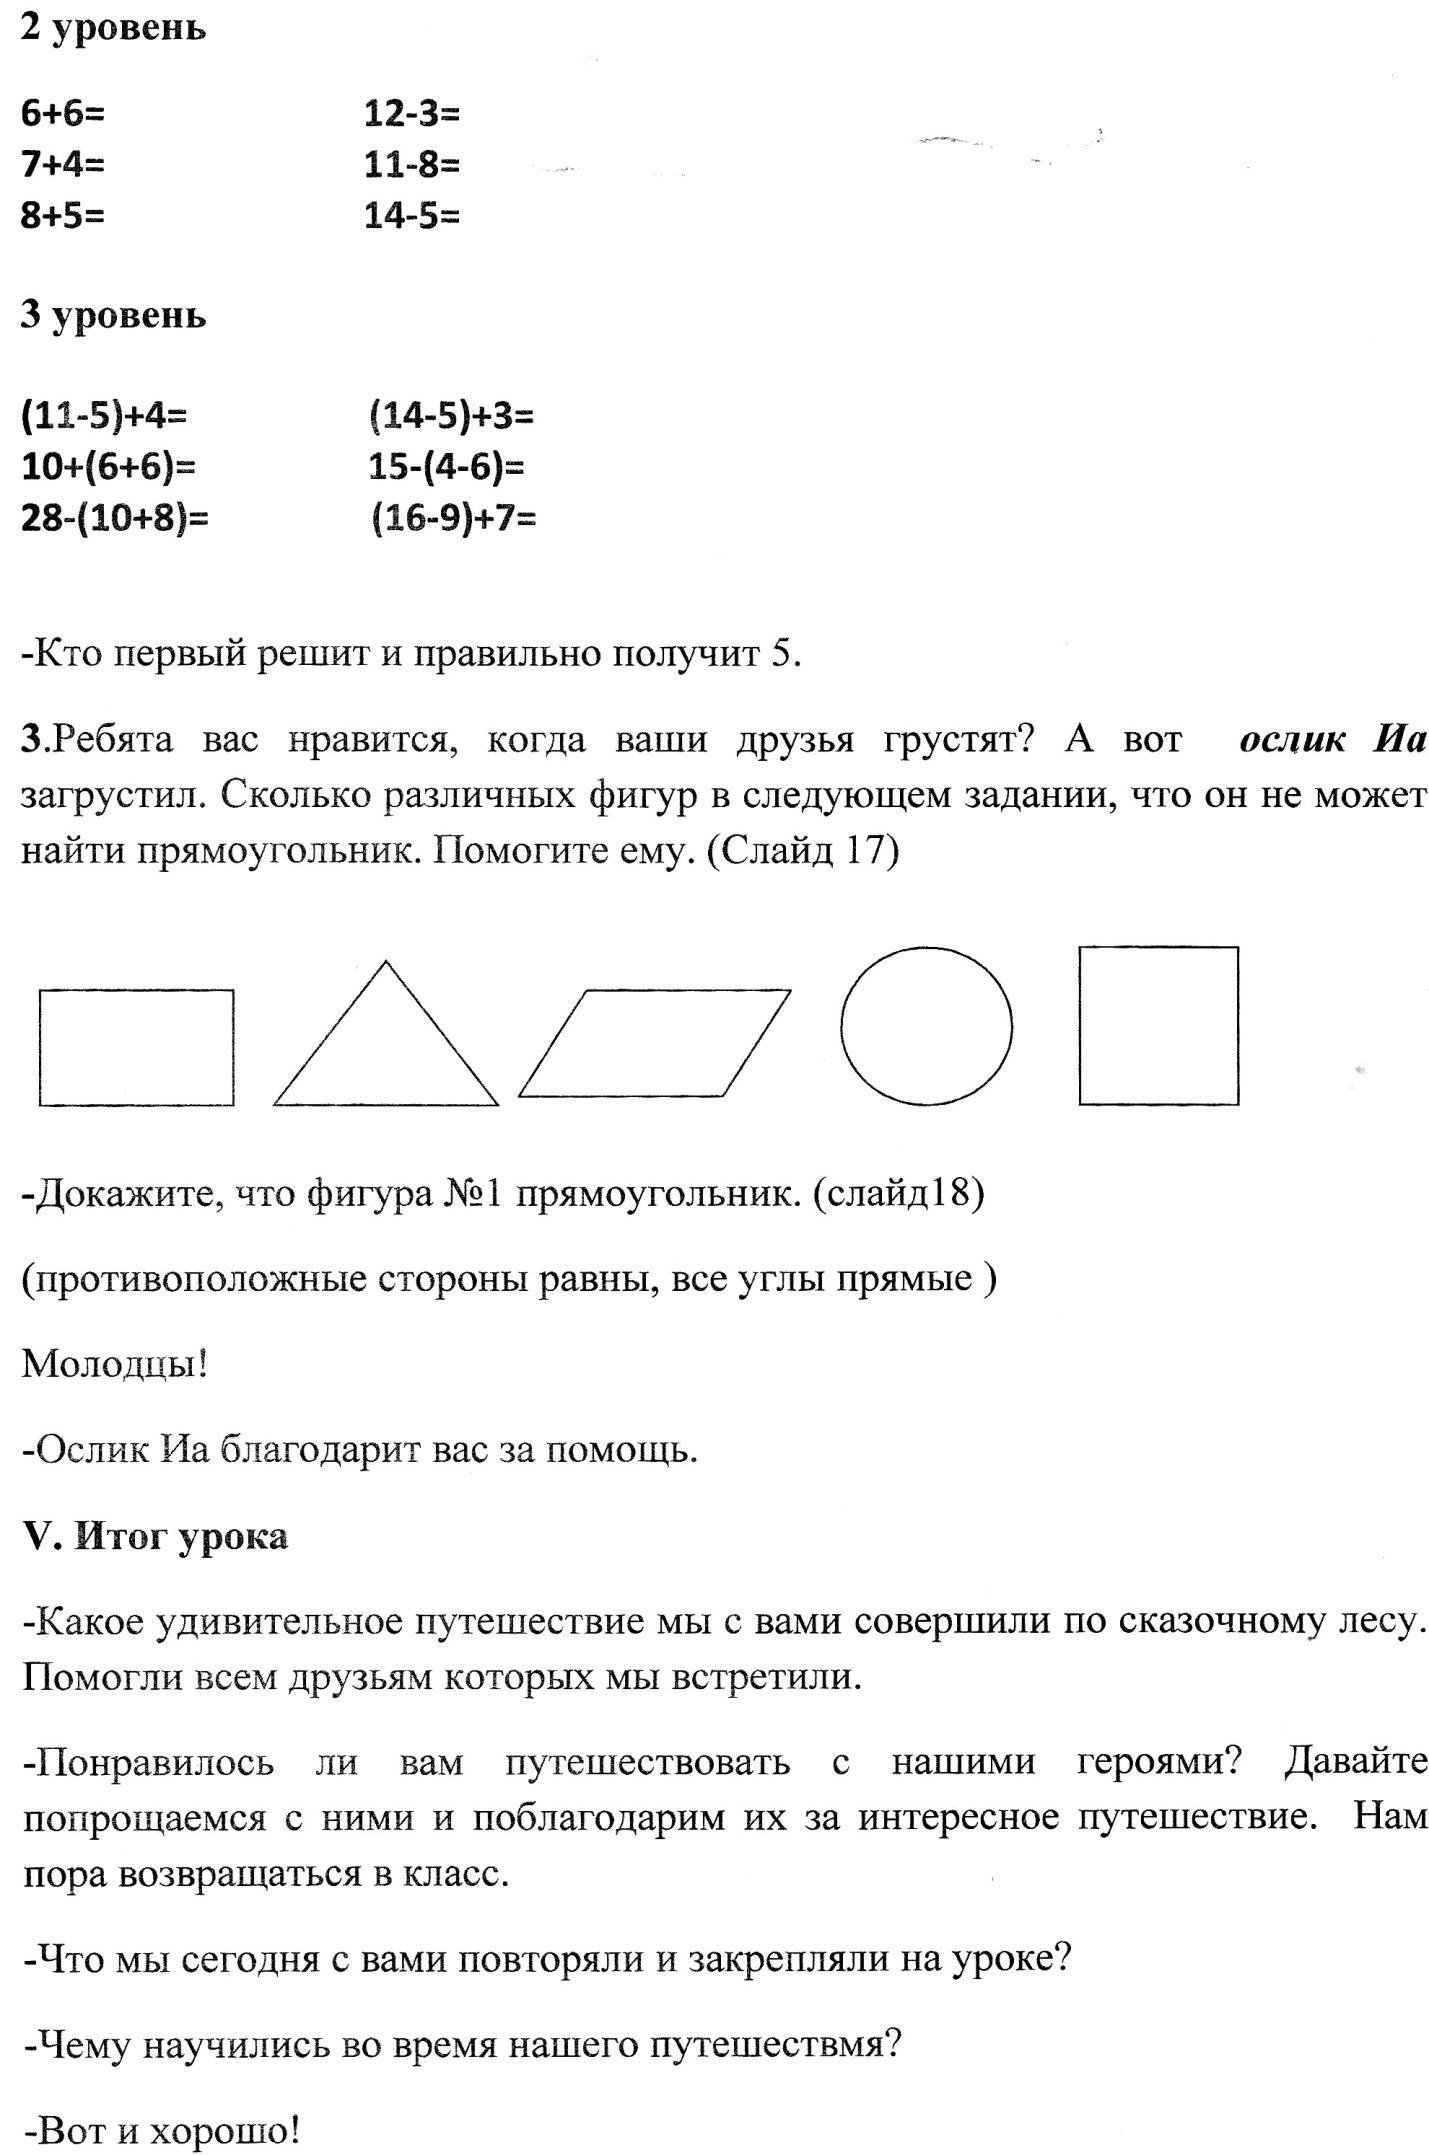 C:\Users\Жирафчик\AppData\Local\Microsoft\Windows\Temporary Internet Files\Content.Word\img068.jpg